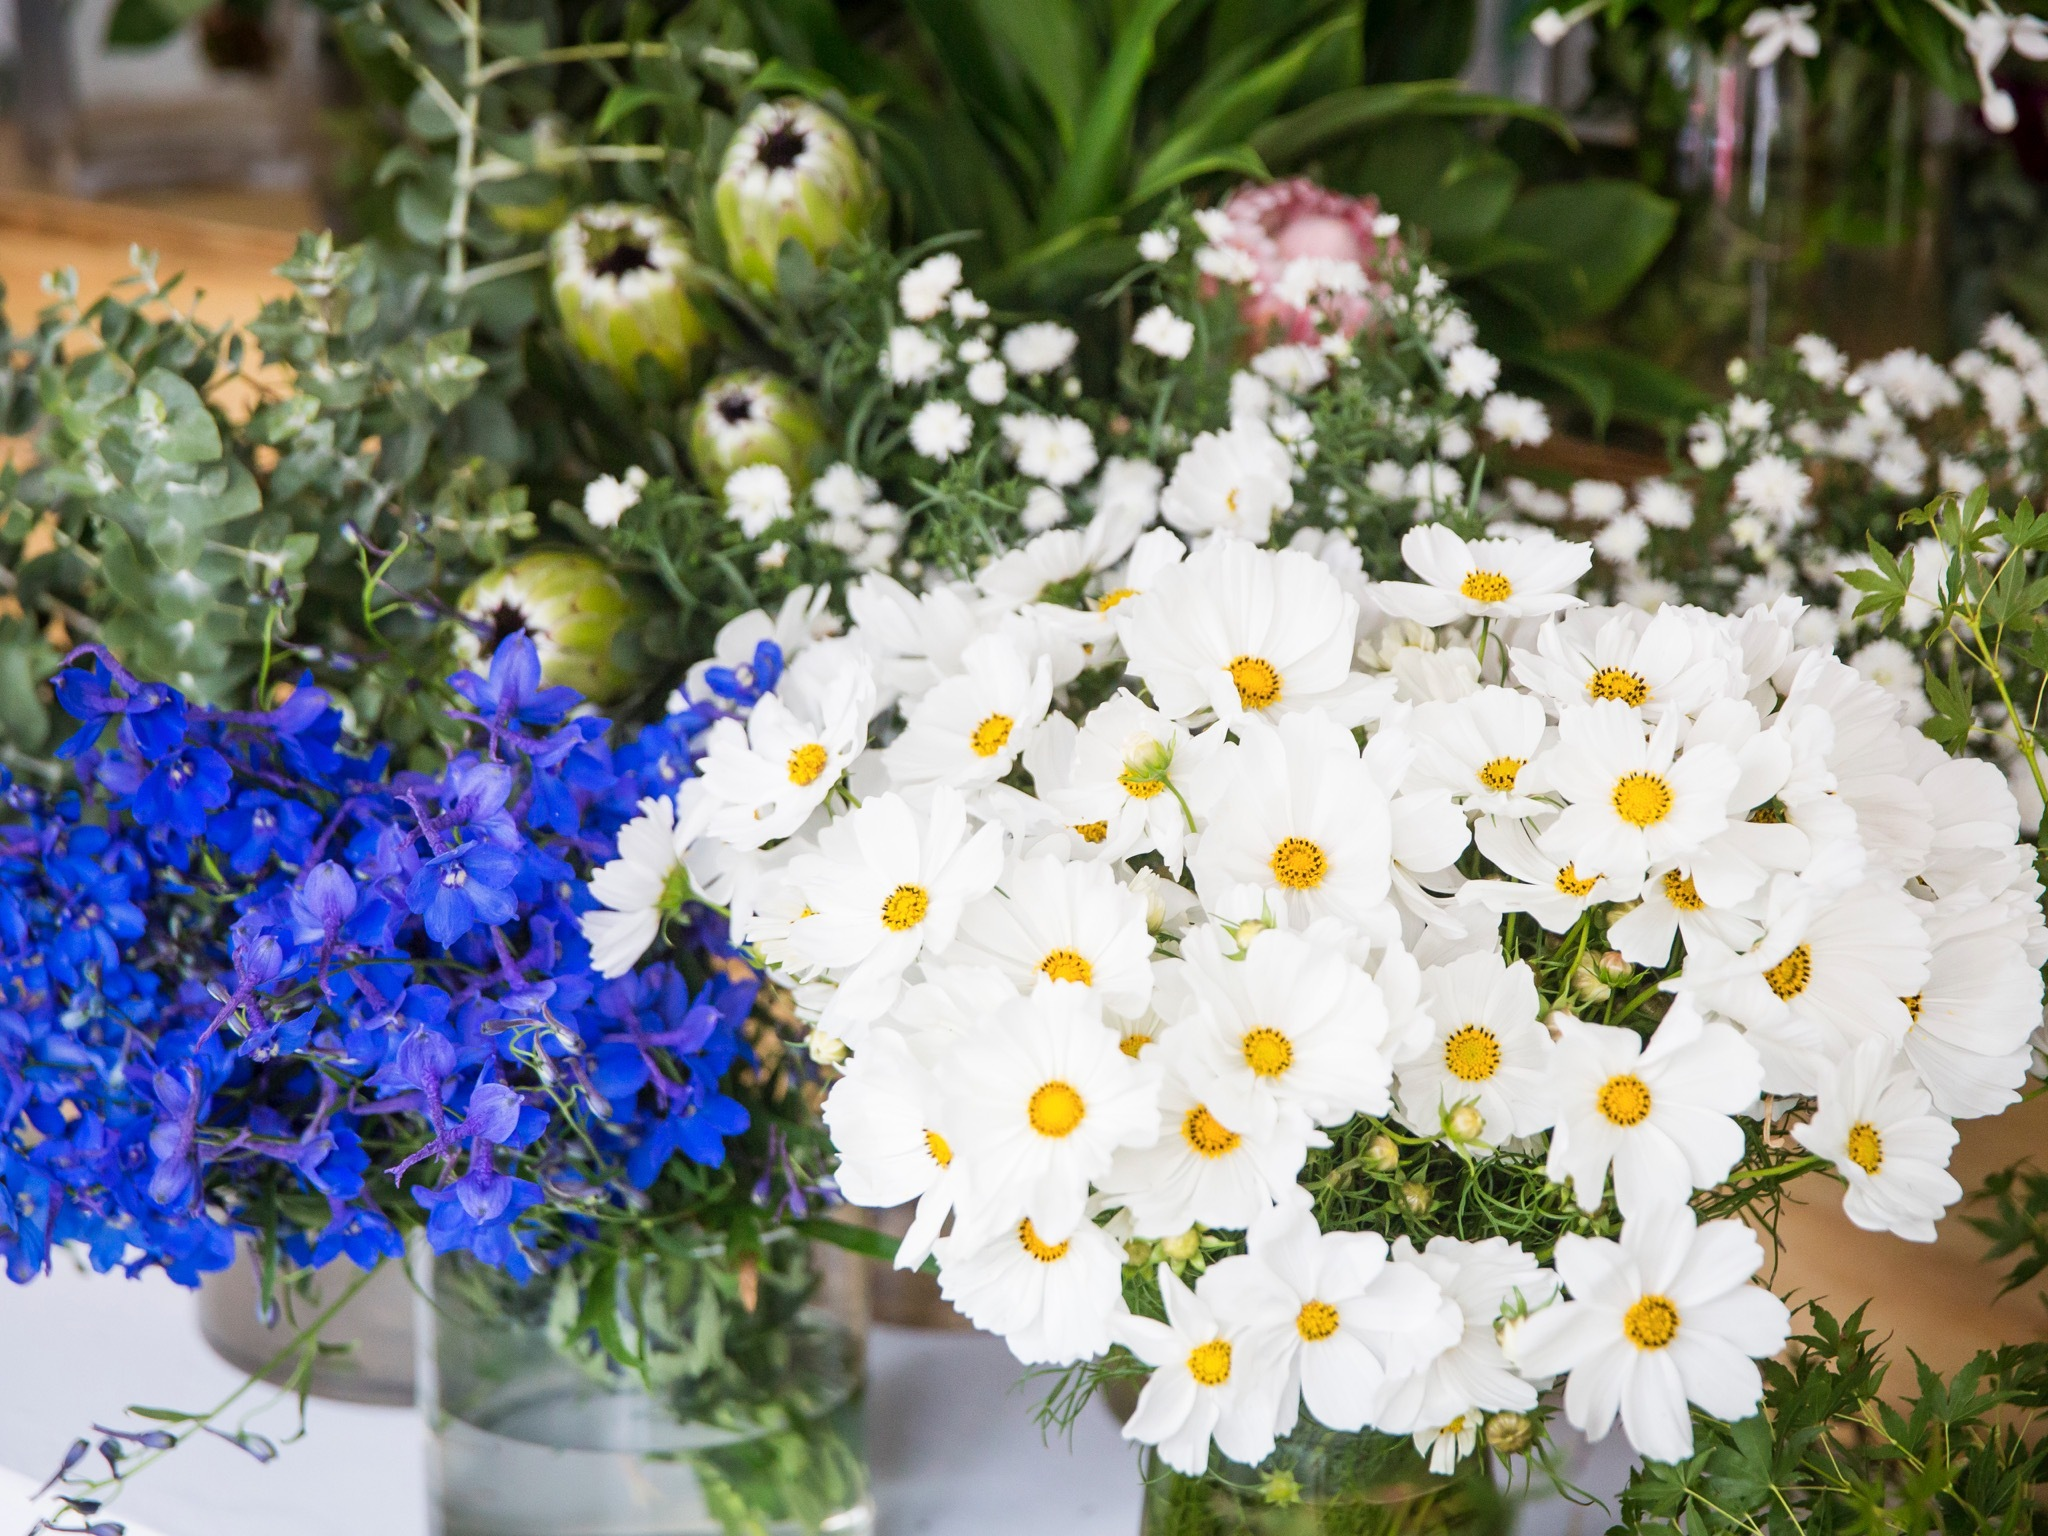 Flowers at My Flower Man